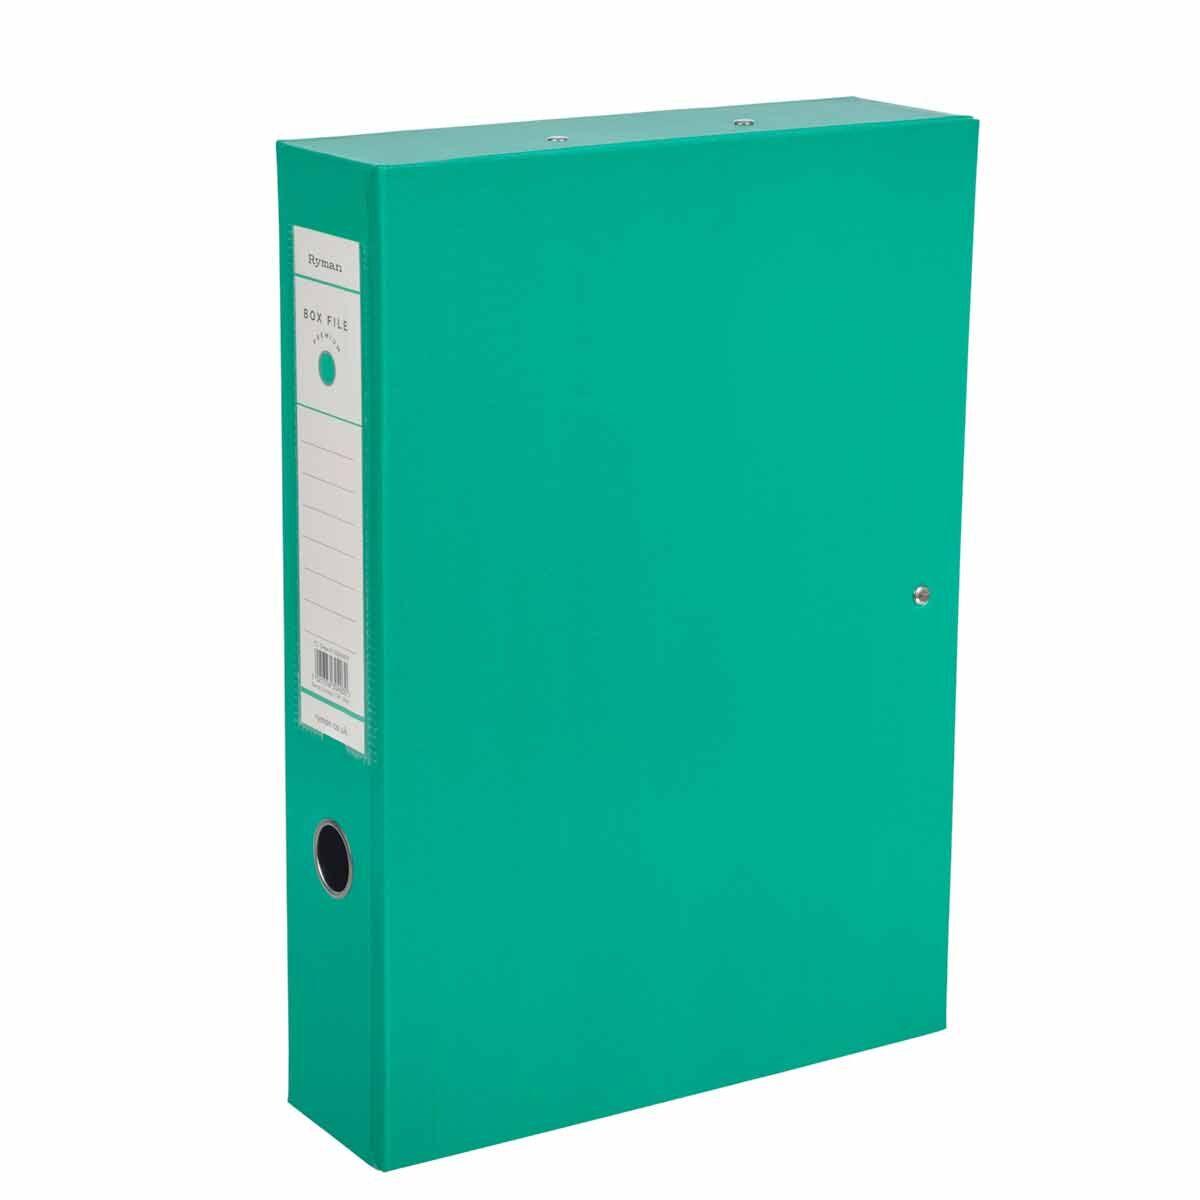 Ryman Premium Box File Foolscap Green